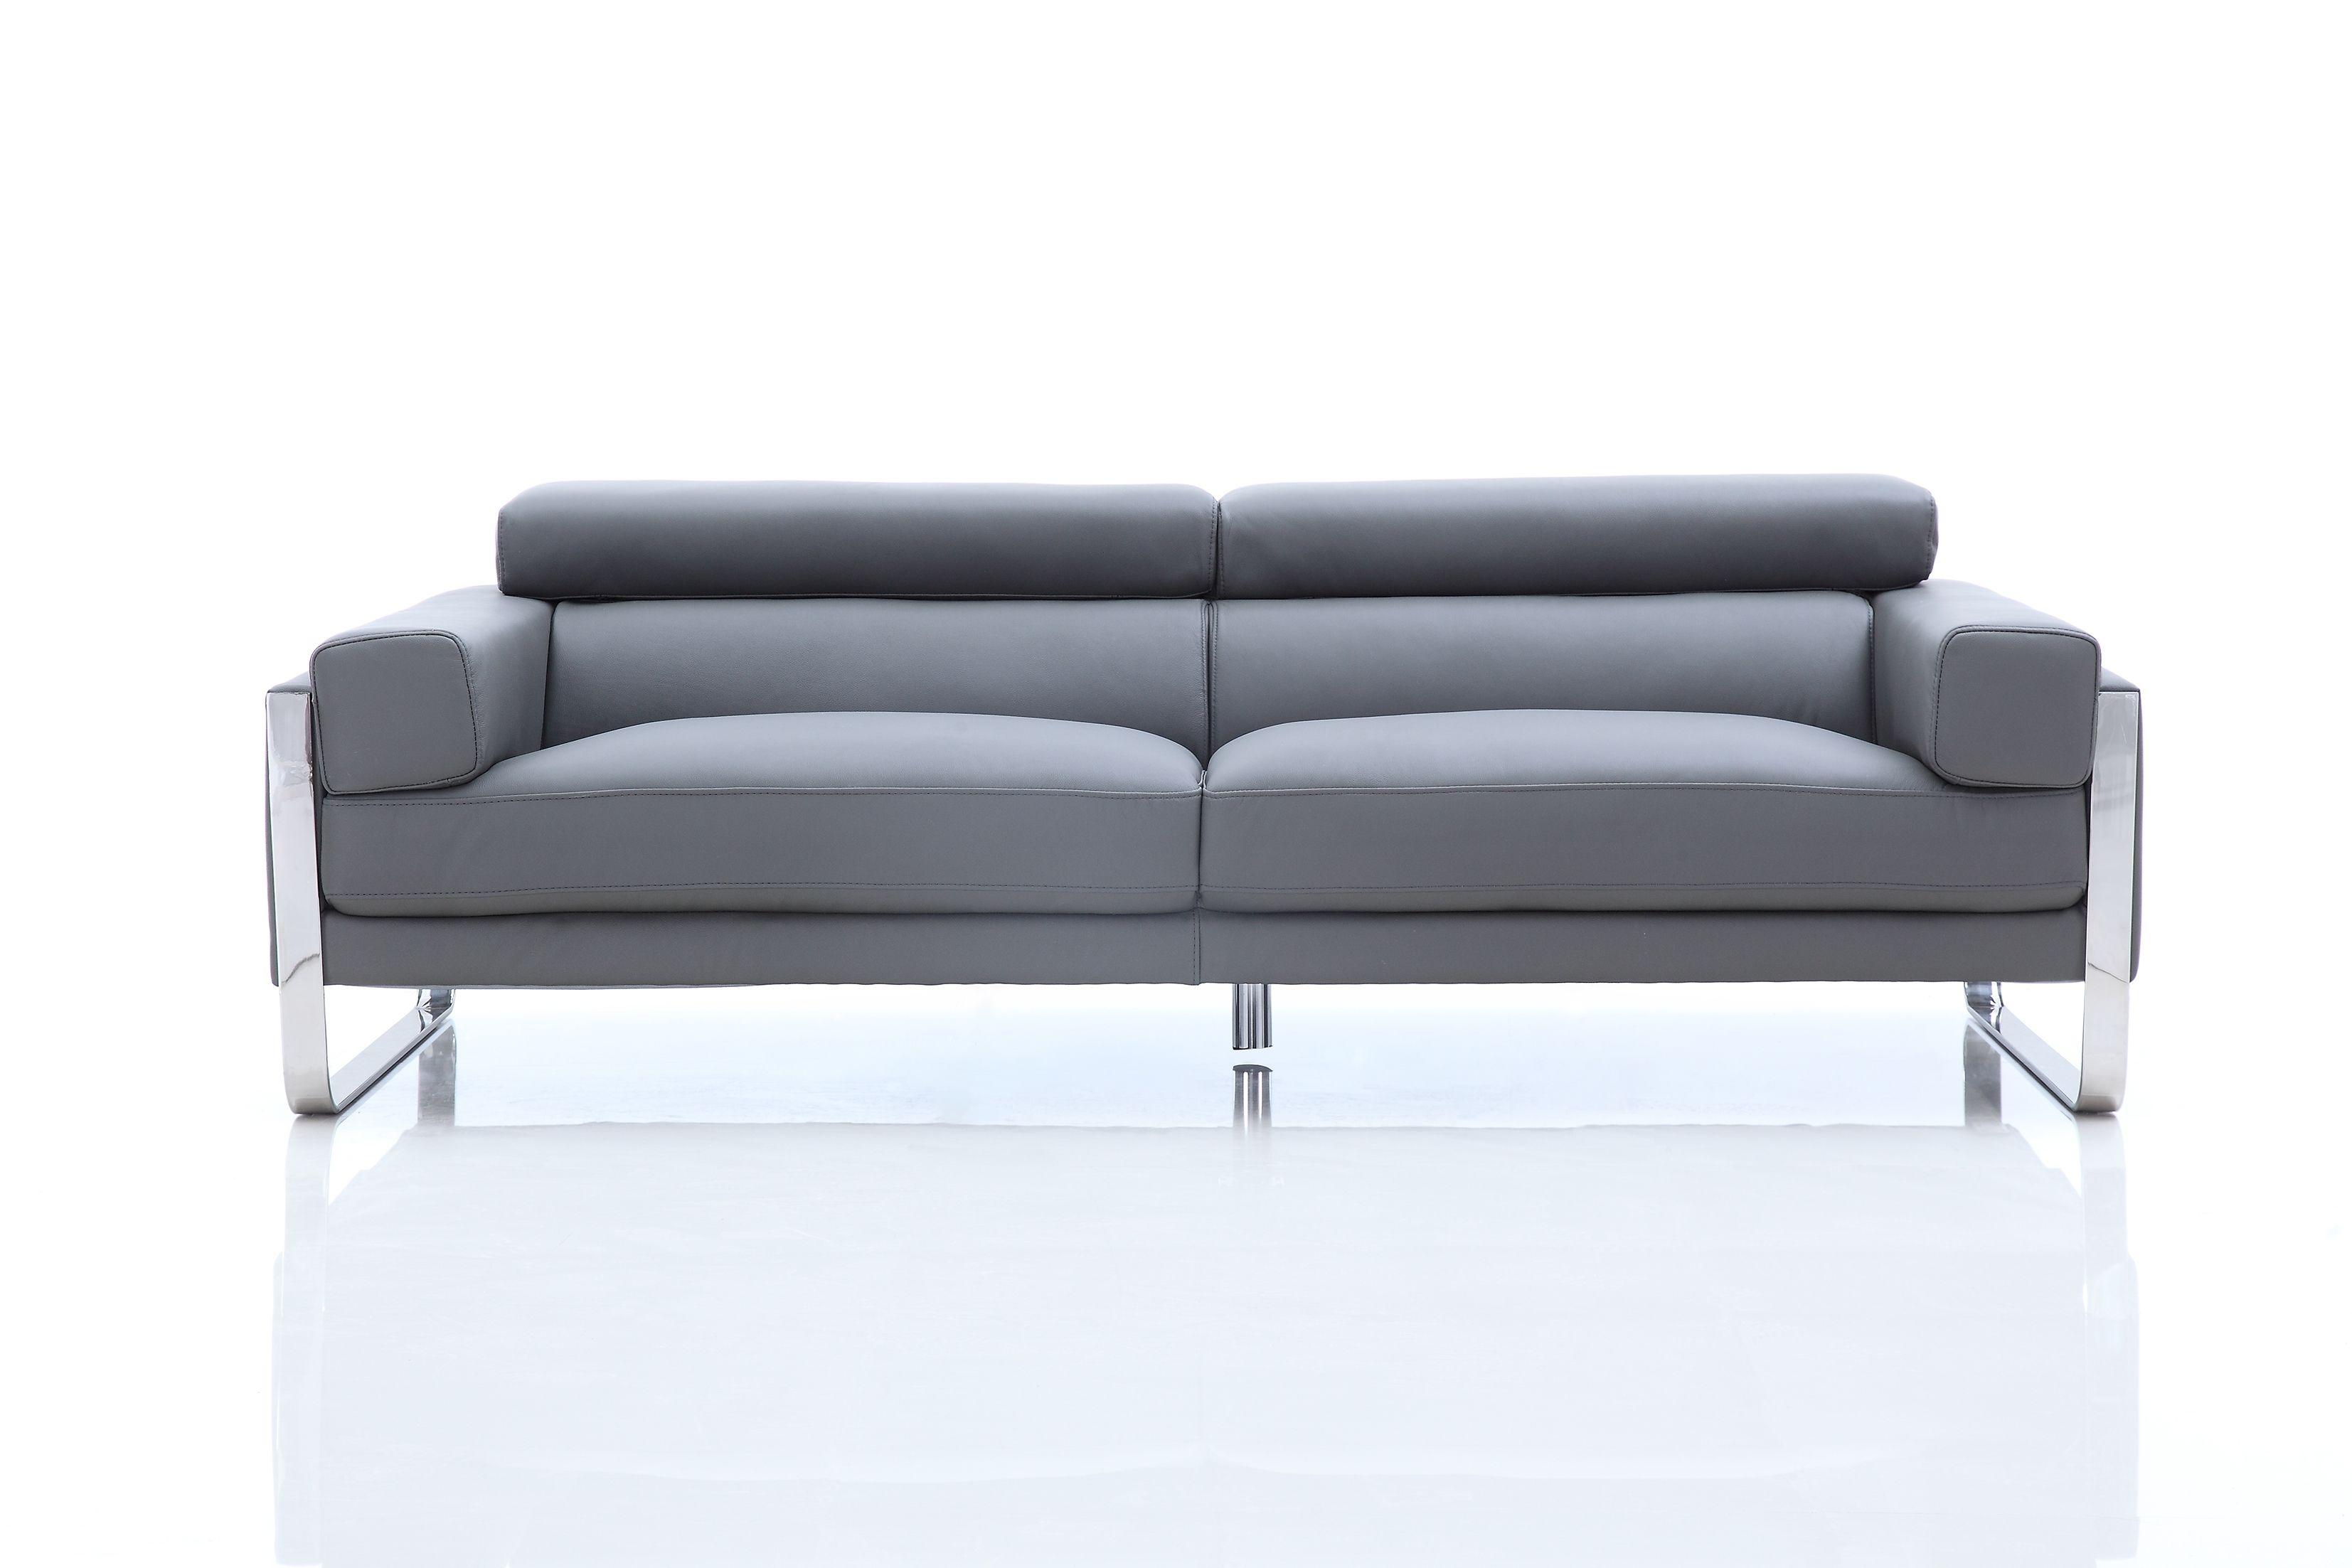 to buy sofa in london inflatable outdoor juliett leather online uk denelli italia